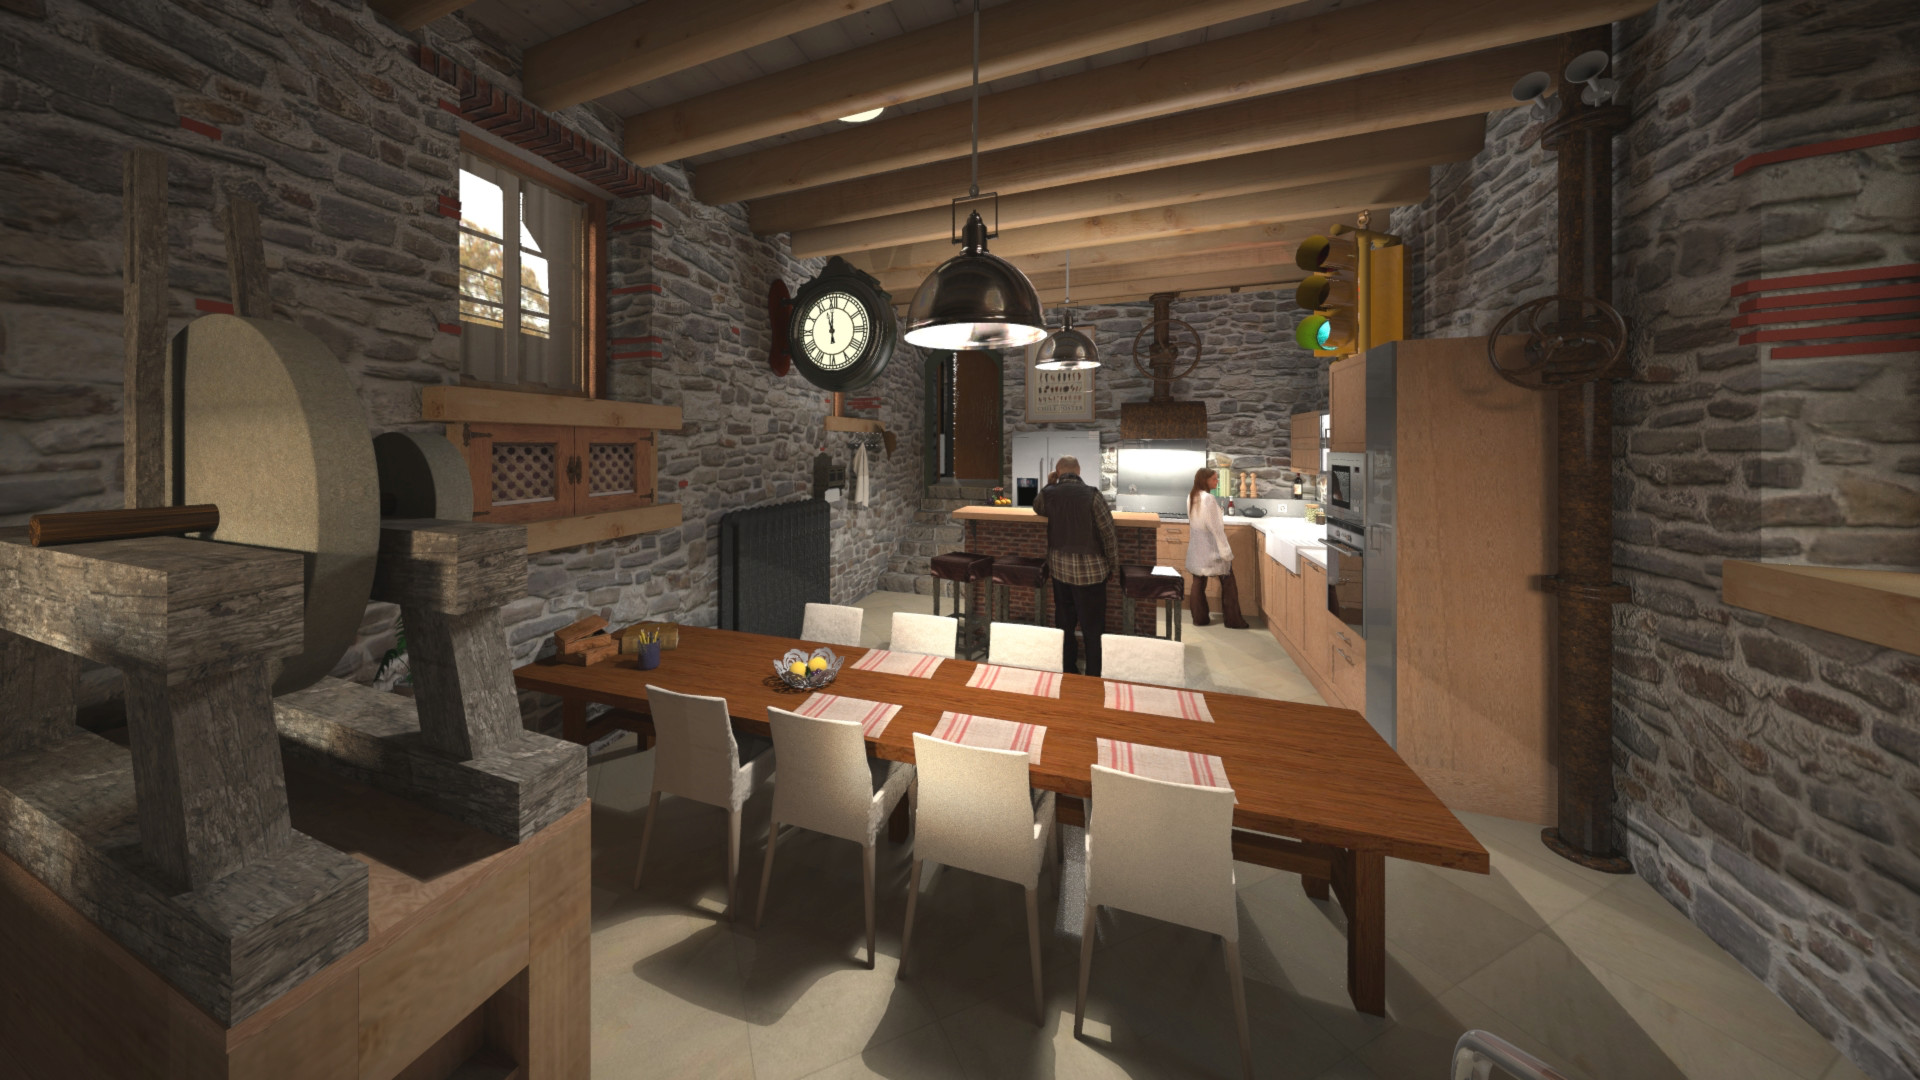 Duane kemp rivendell 16 kitchen test 15 a rusty